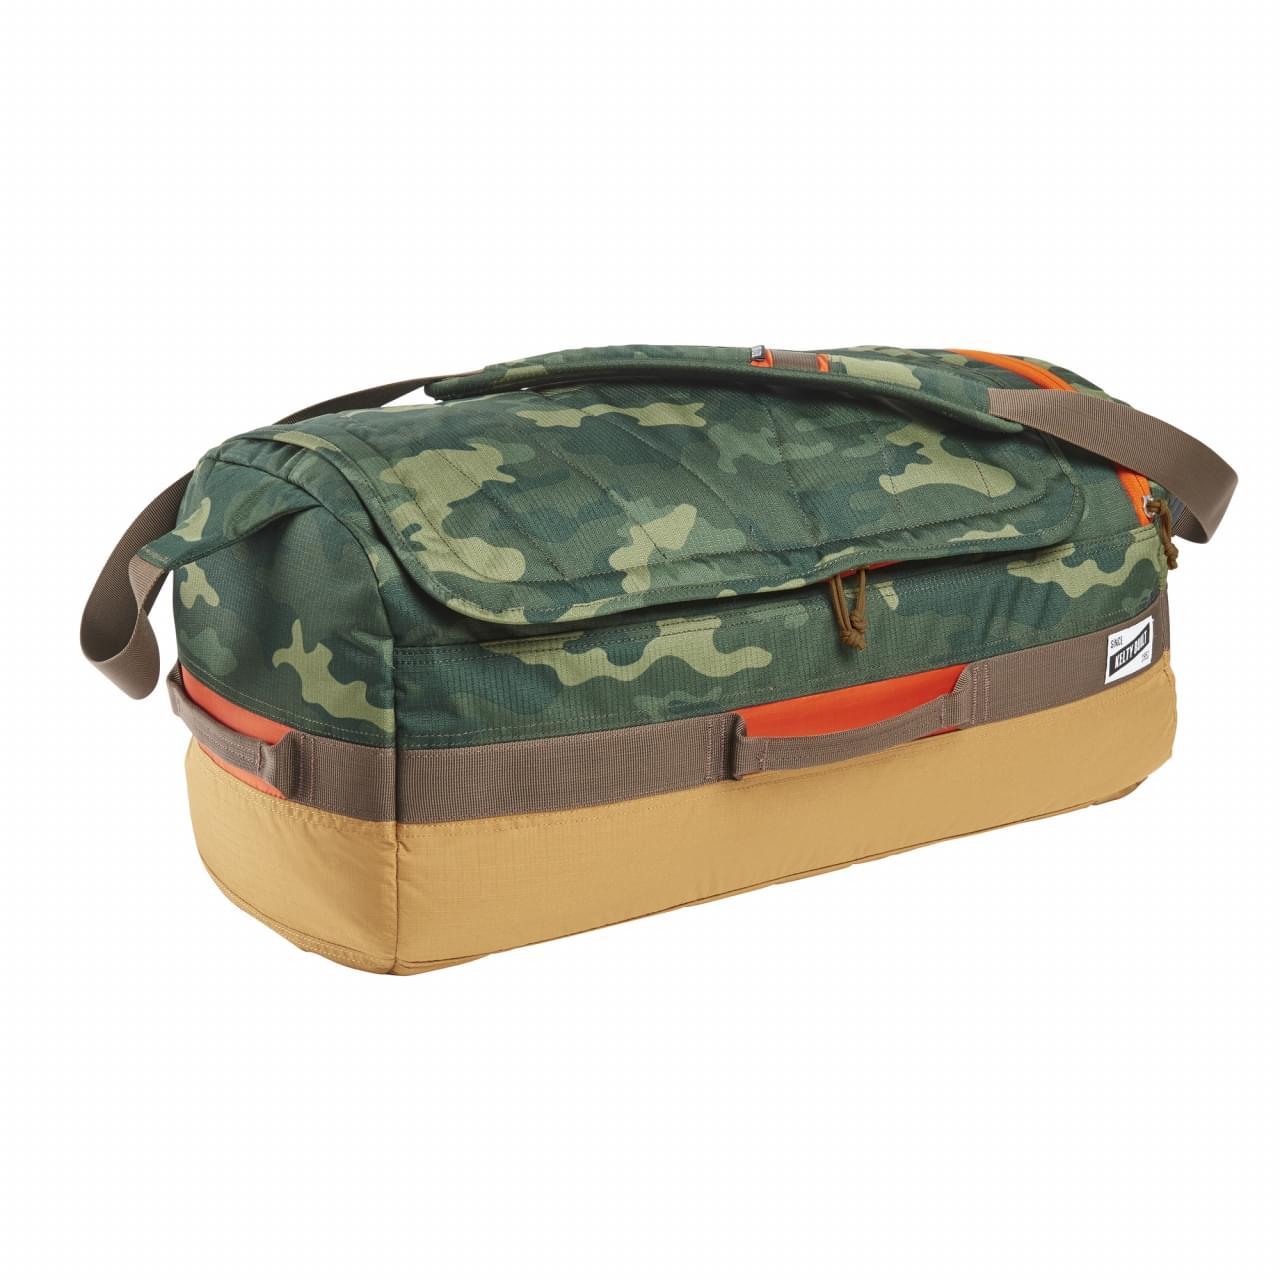 Kelty Dodger 40 Duffel - Camouflage